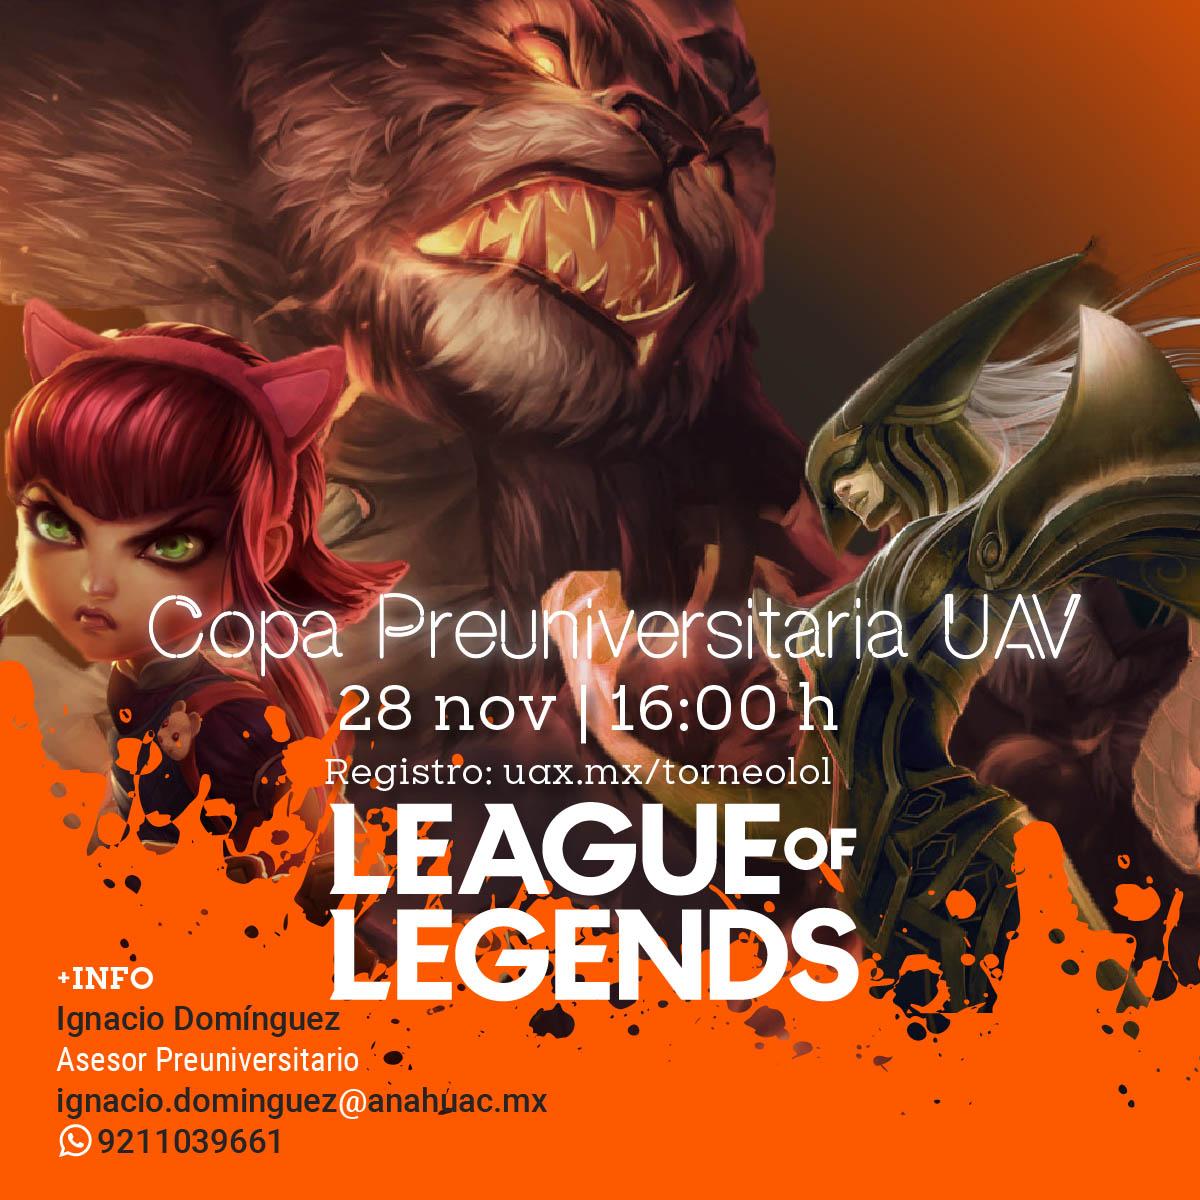 Copa Preuniversitaria UAV League of Legends